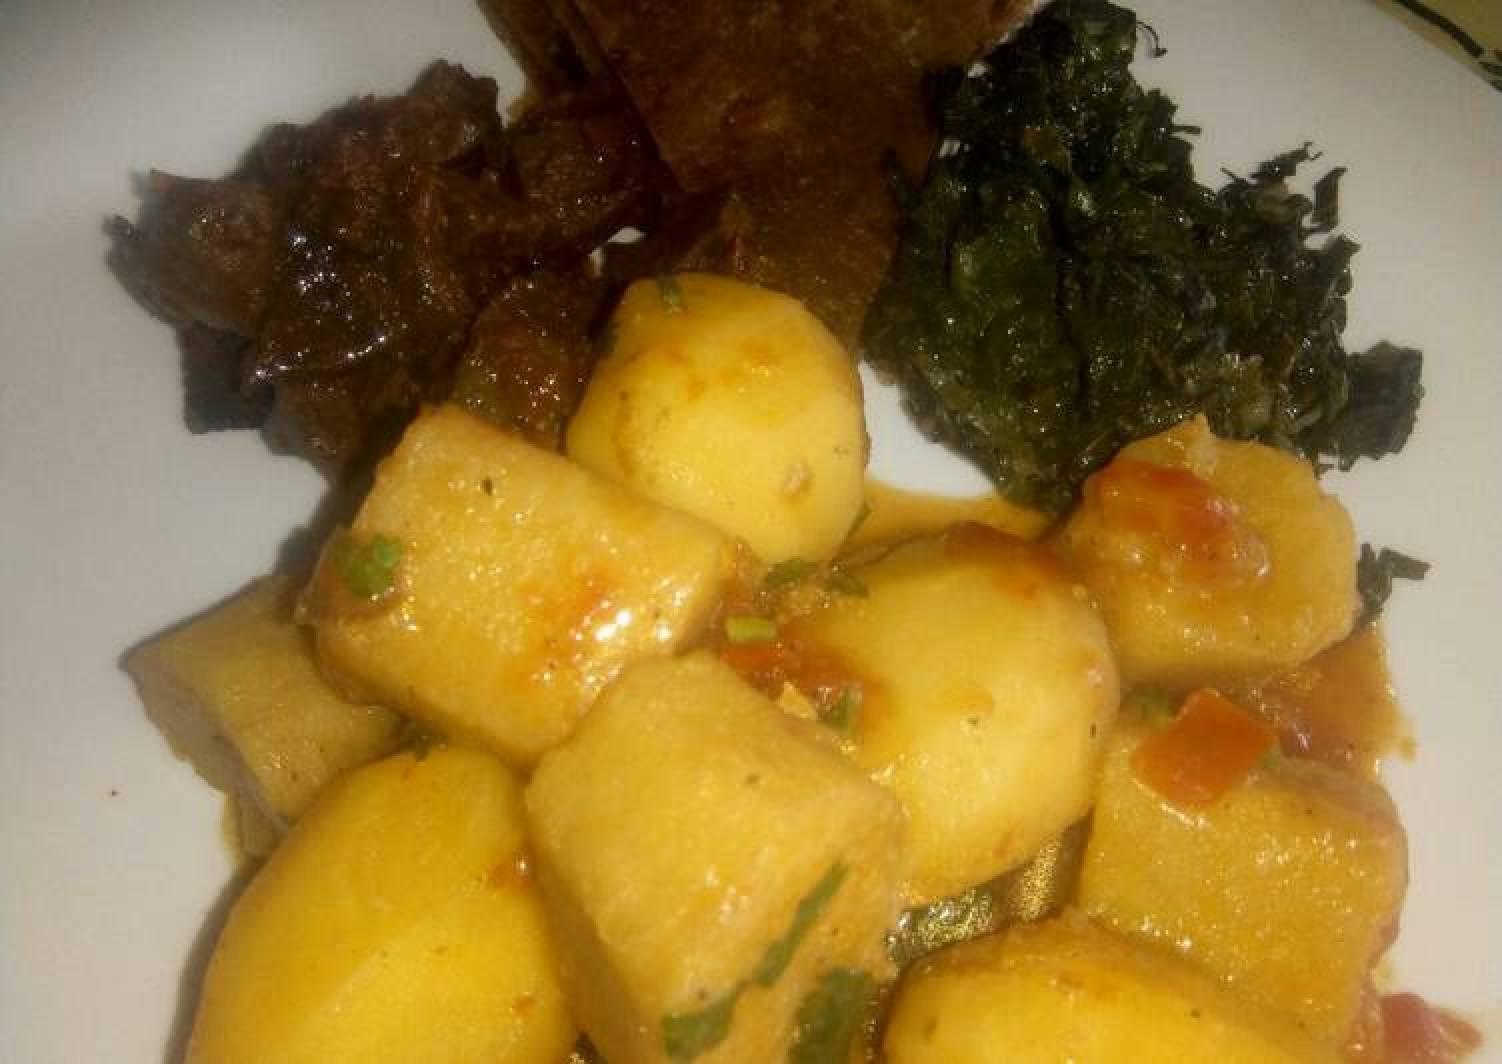 Potato and matoke stew